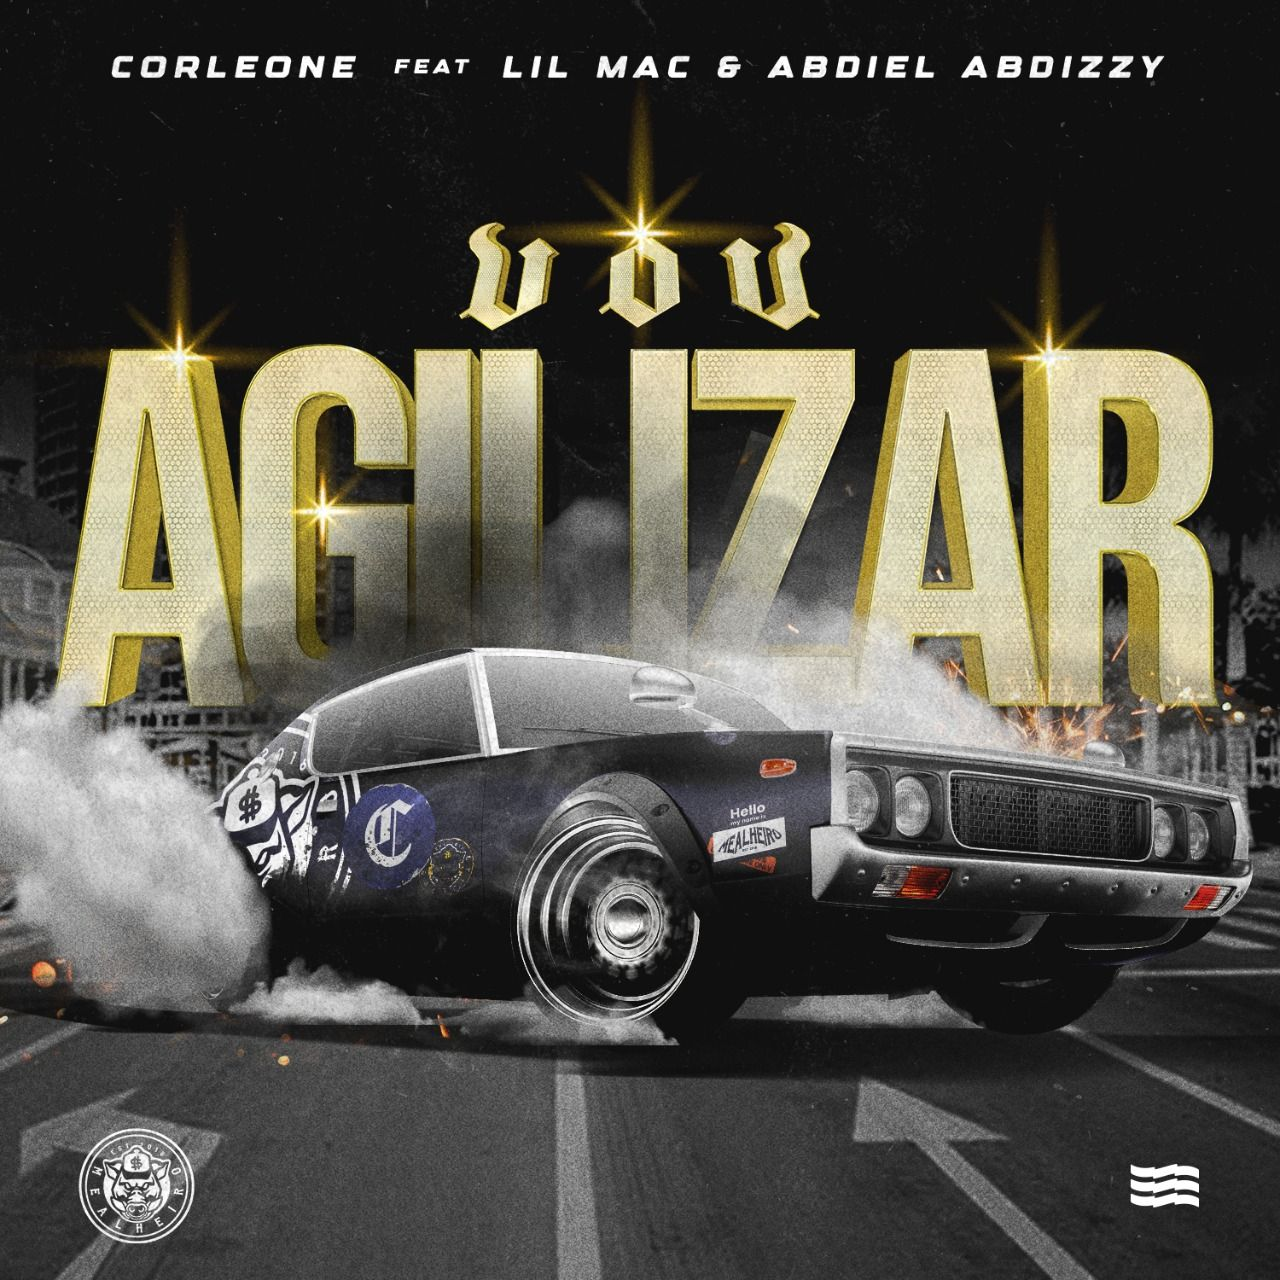 Corleone – Vou Agilizar (feat. Lil Mac & Abdiel Abdizzy)